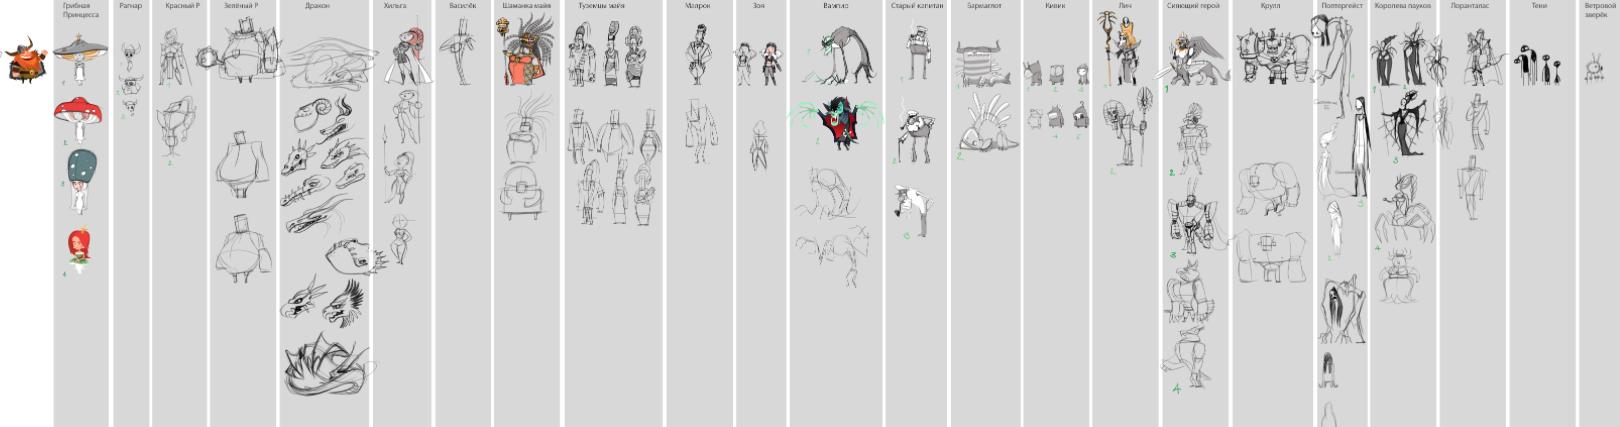 Die With Glory – сник-пик персонажей - Изображение 1